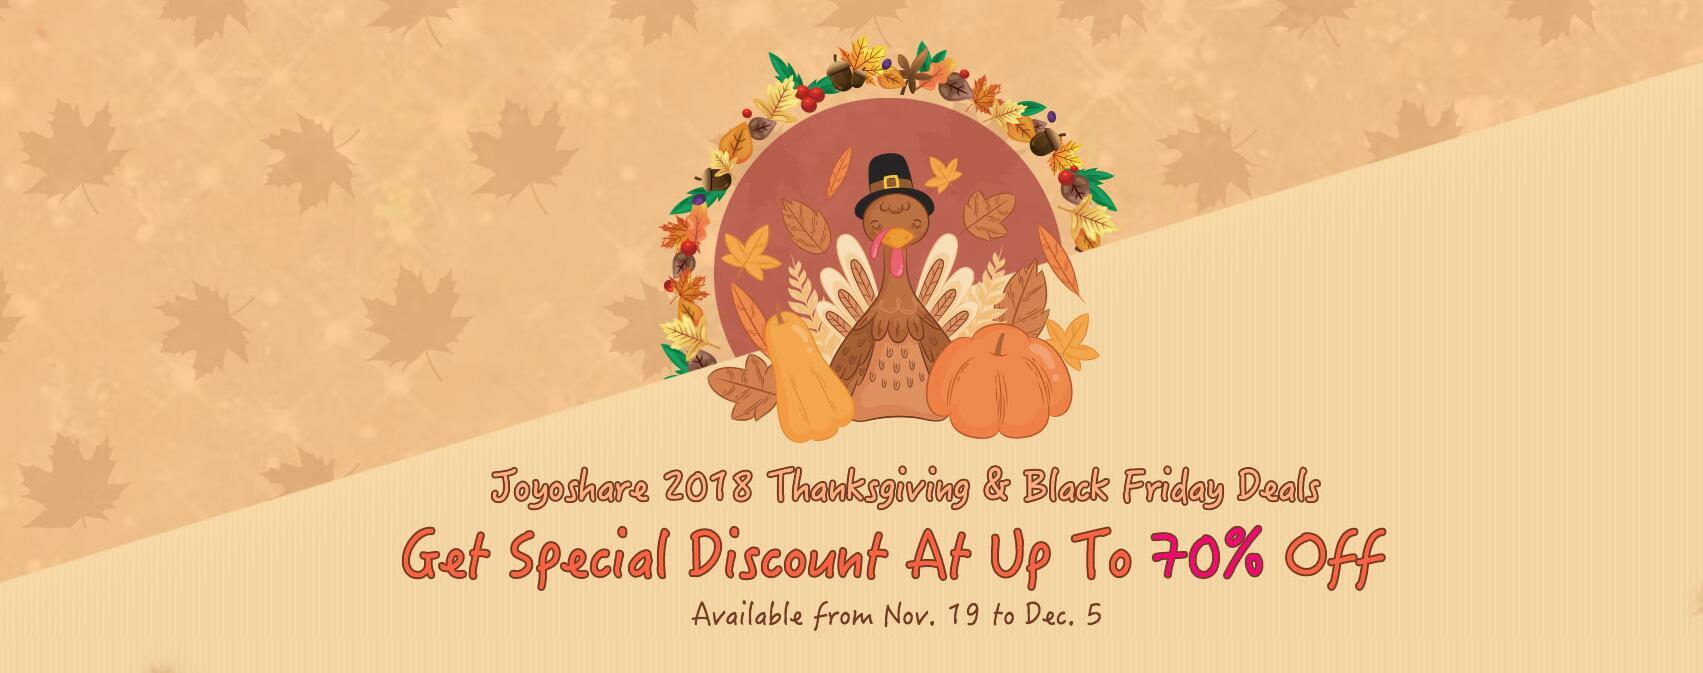 joyoshare-thanksgiving-sales